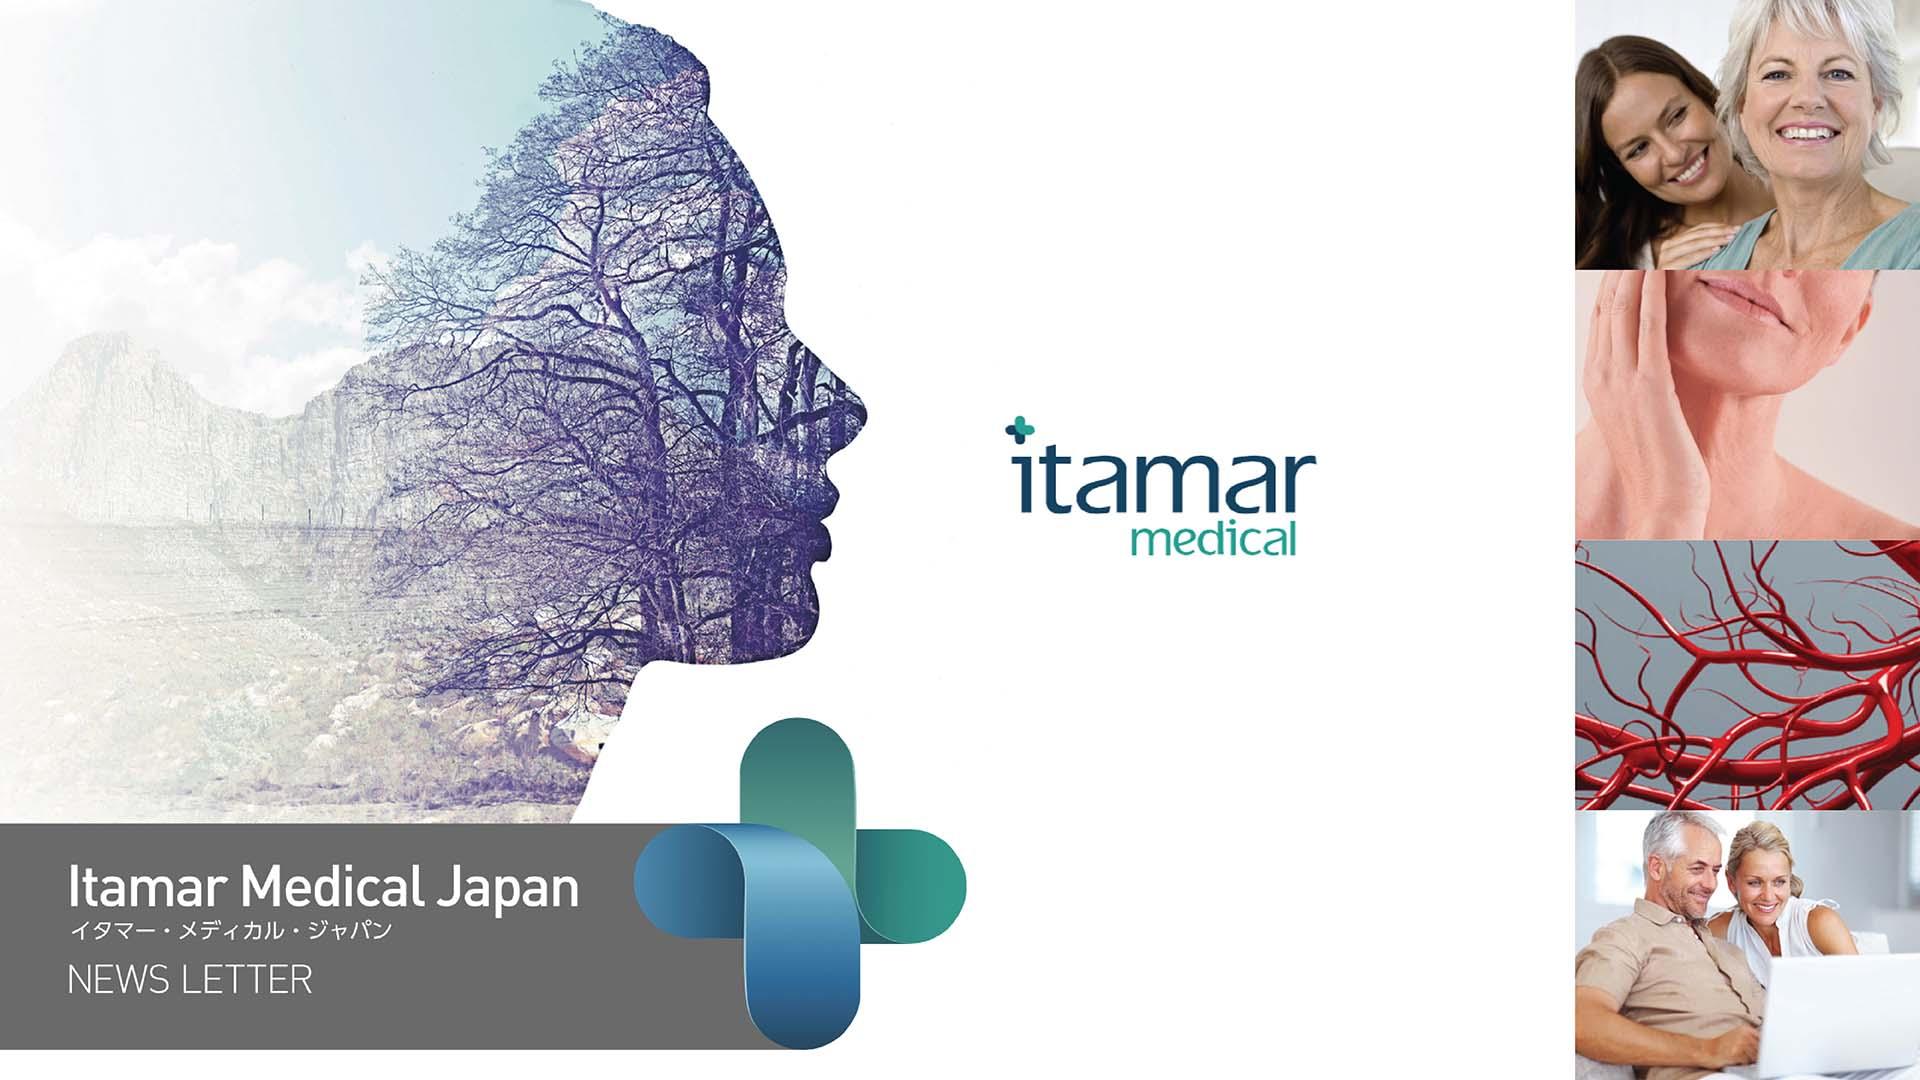 ITAMAR MEDICAL JAPAN-featured-image